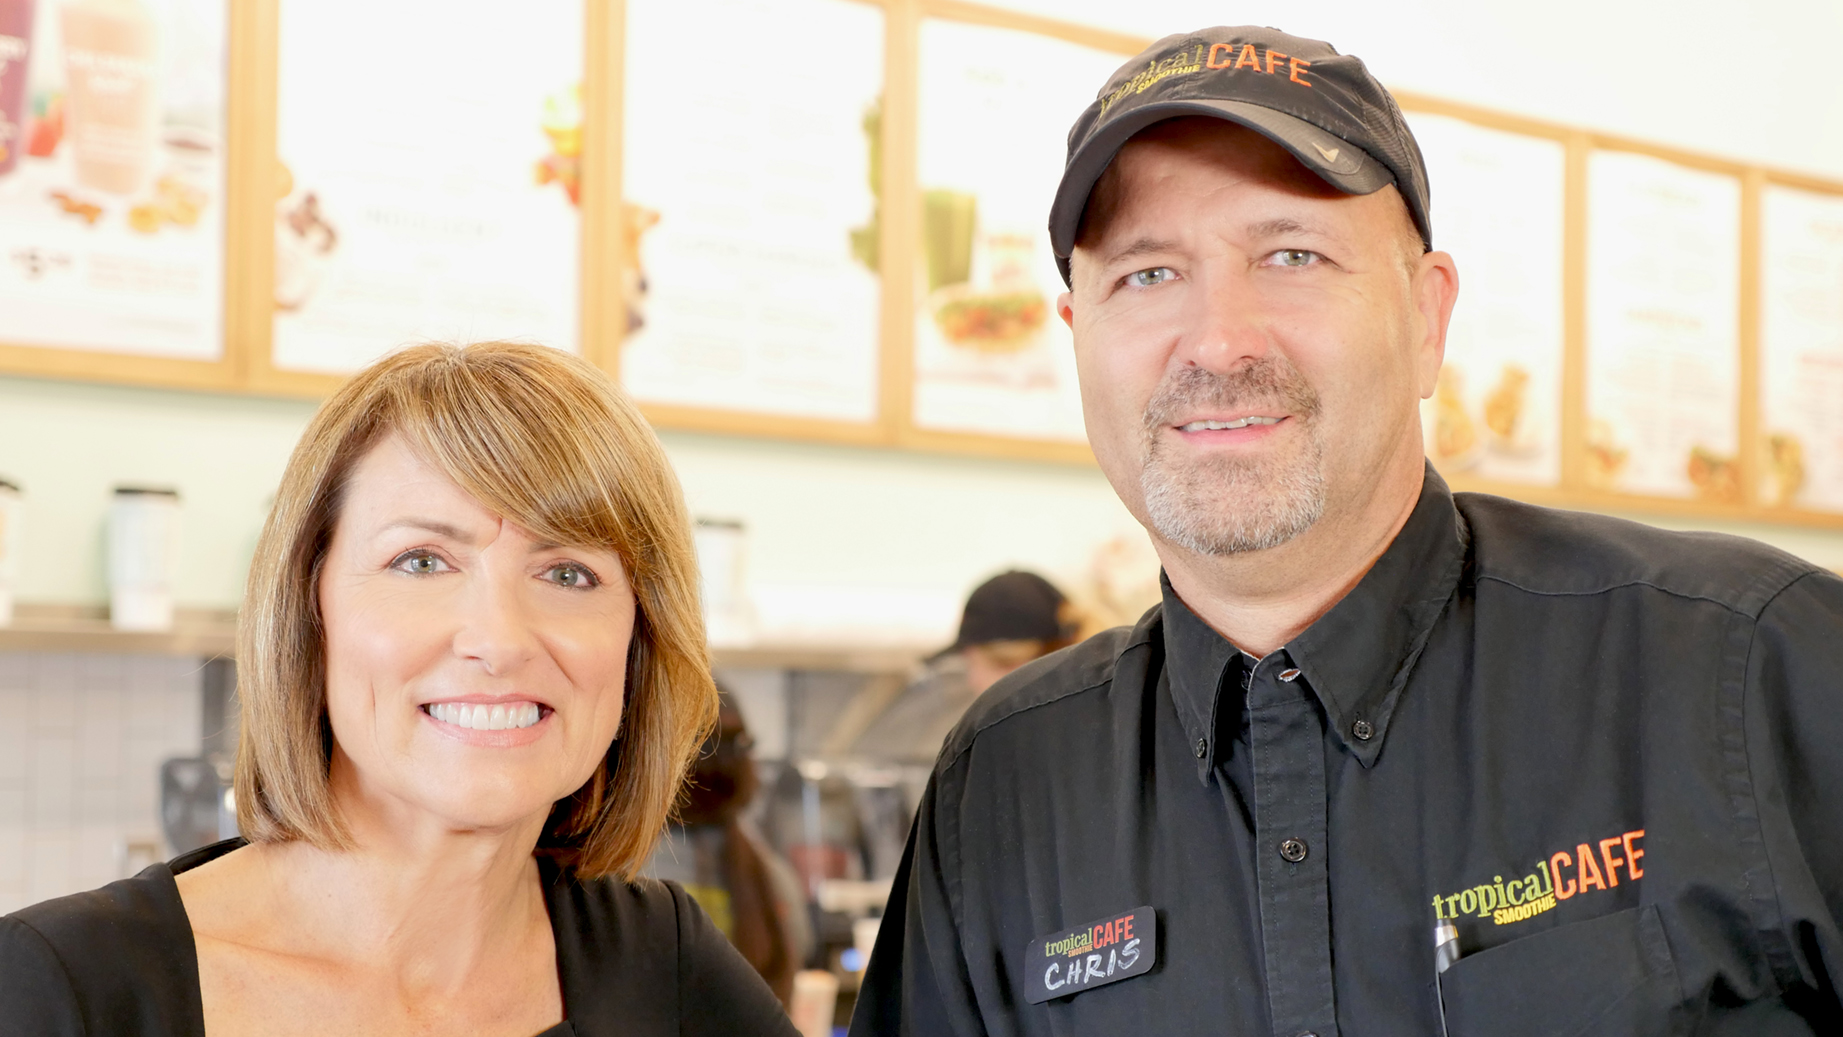 Chris and Debbie Pike